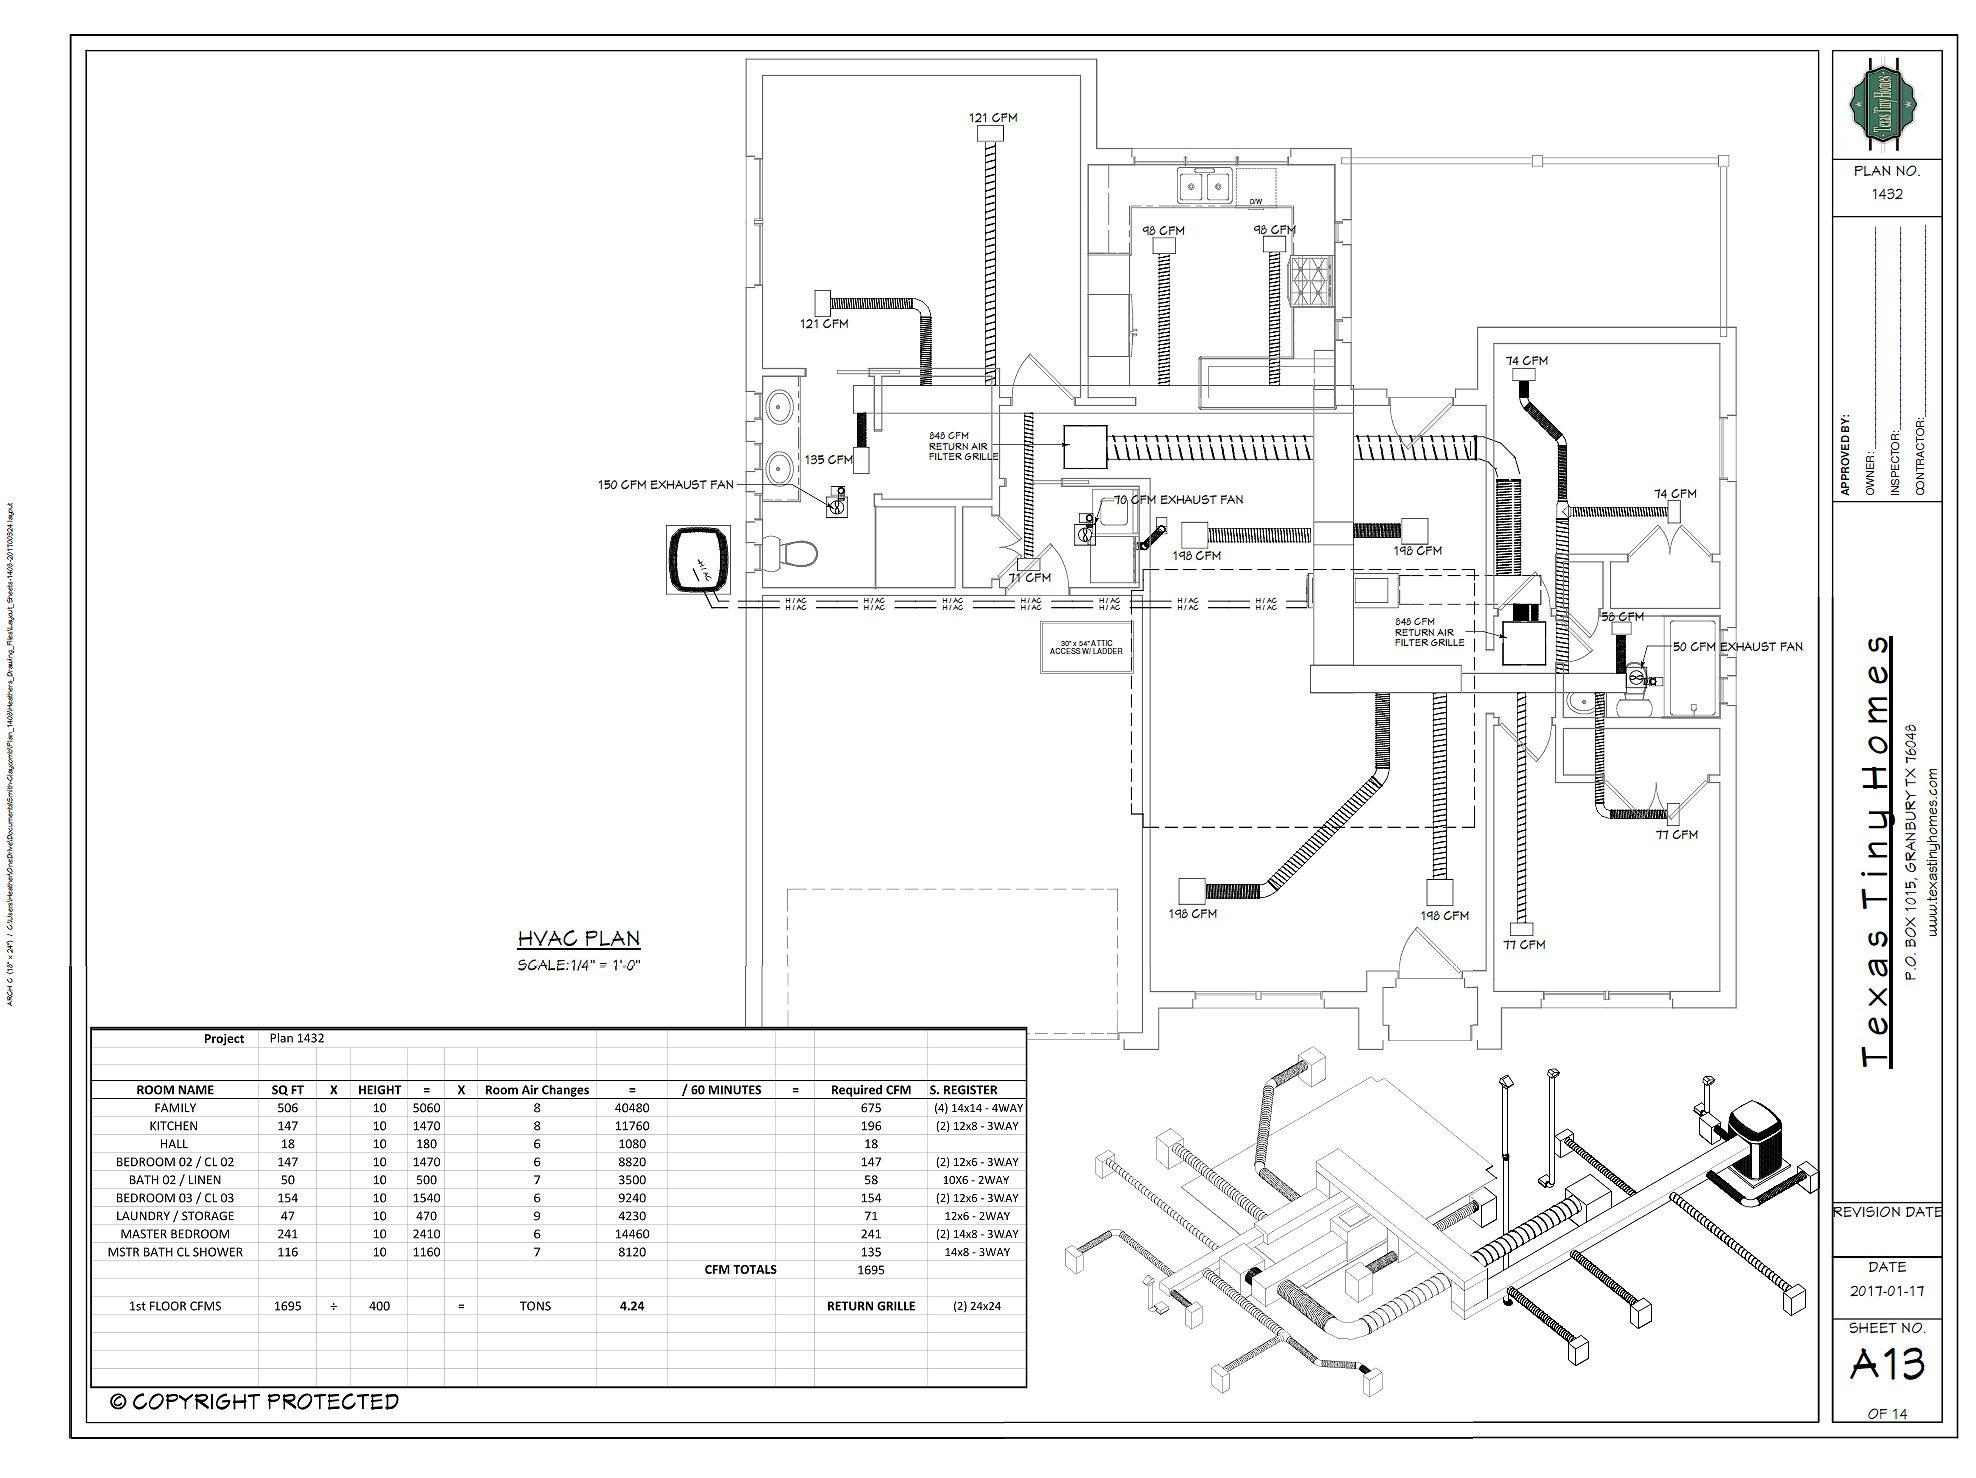 Texas tiny homes plan 1432 for Hvac plan